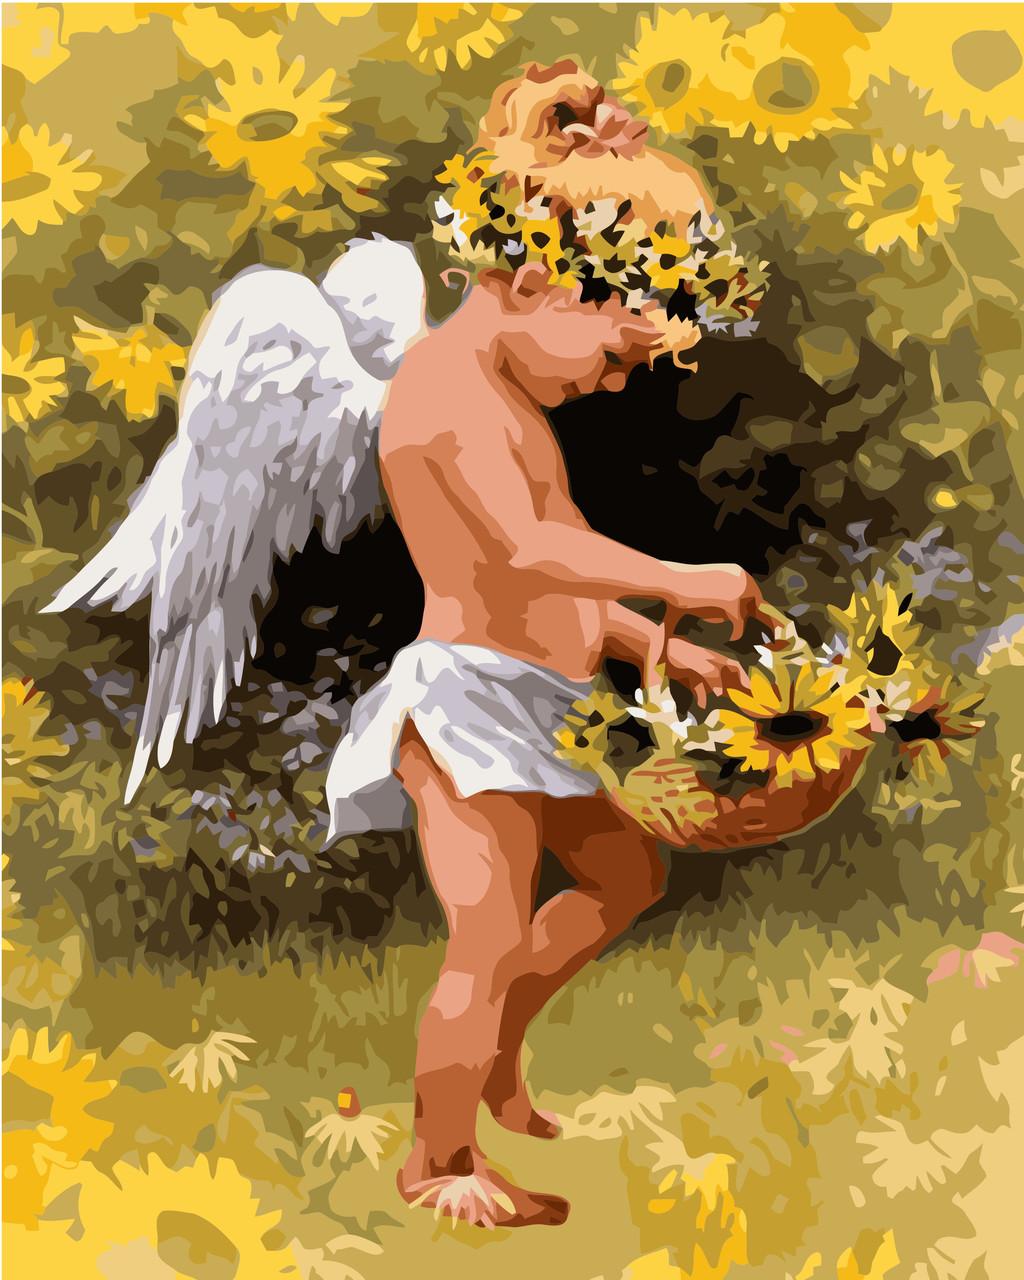 Картина по номерам VA-1583 Маленький ангел в подсолнухах, 40х50см. Strateg